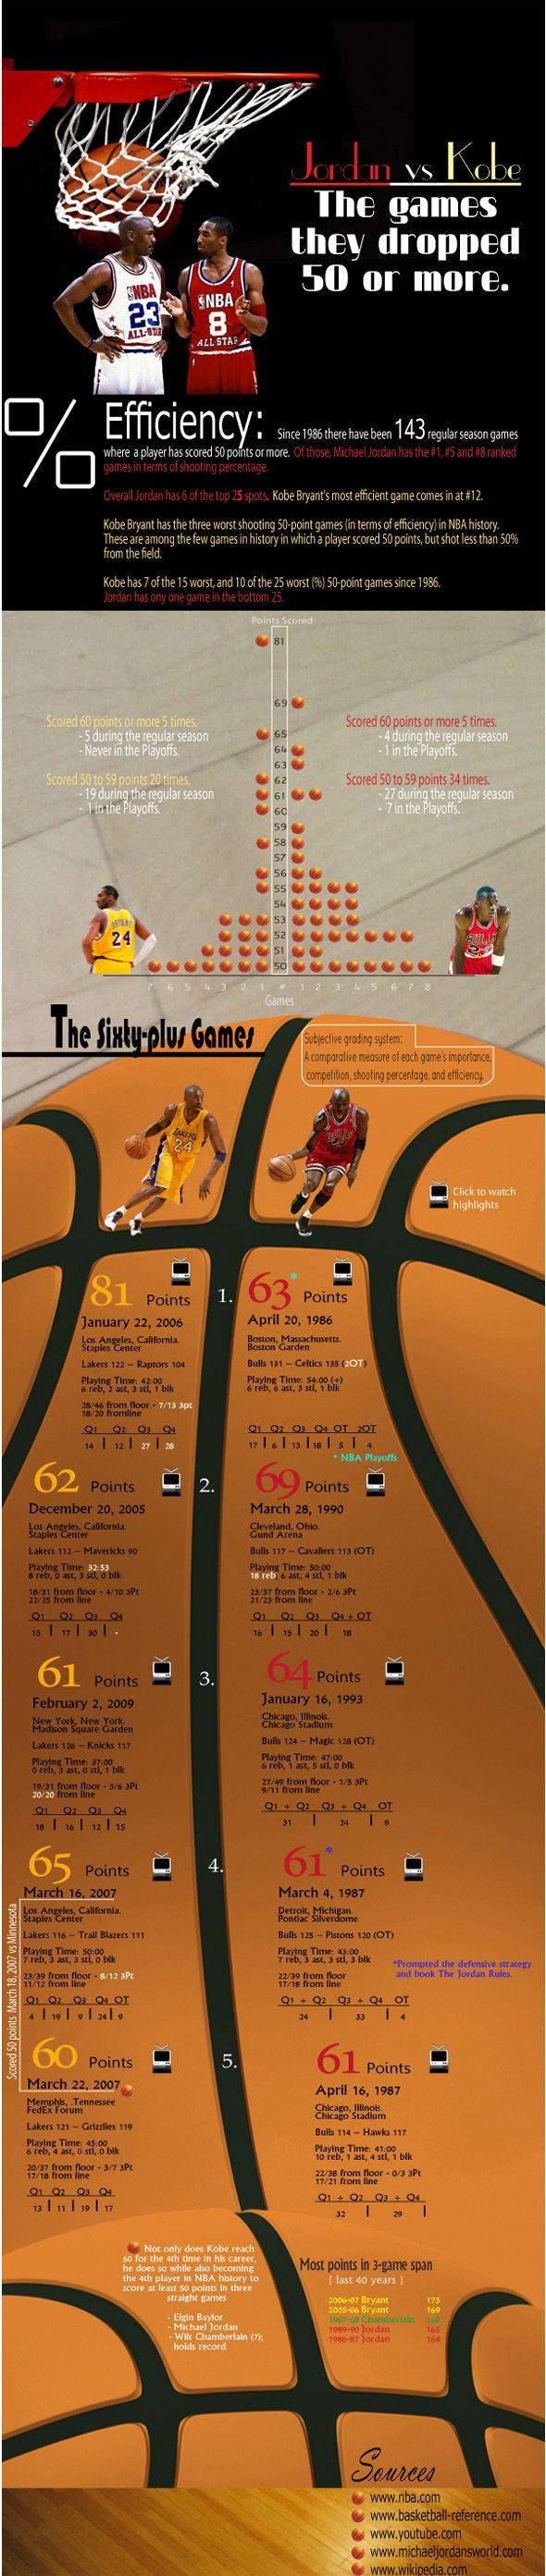 Michael Jordan vs. Kobe Bryant: The 50+ Point Games